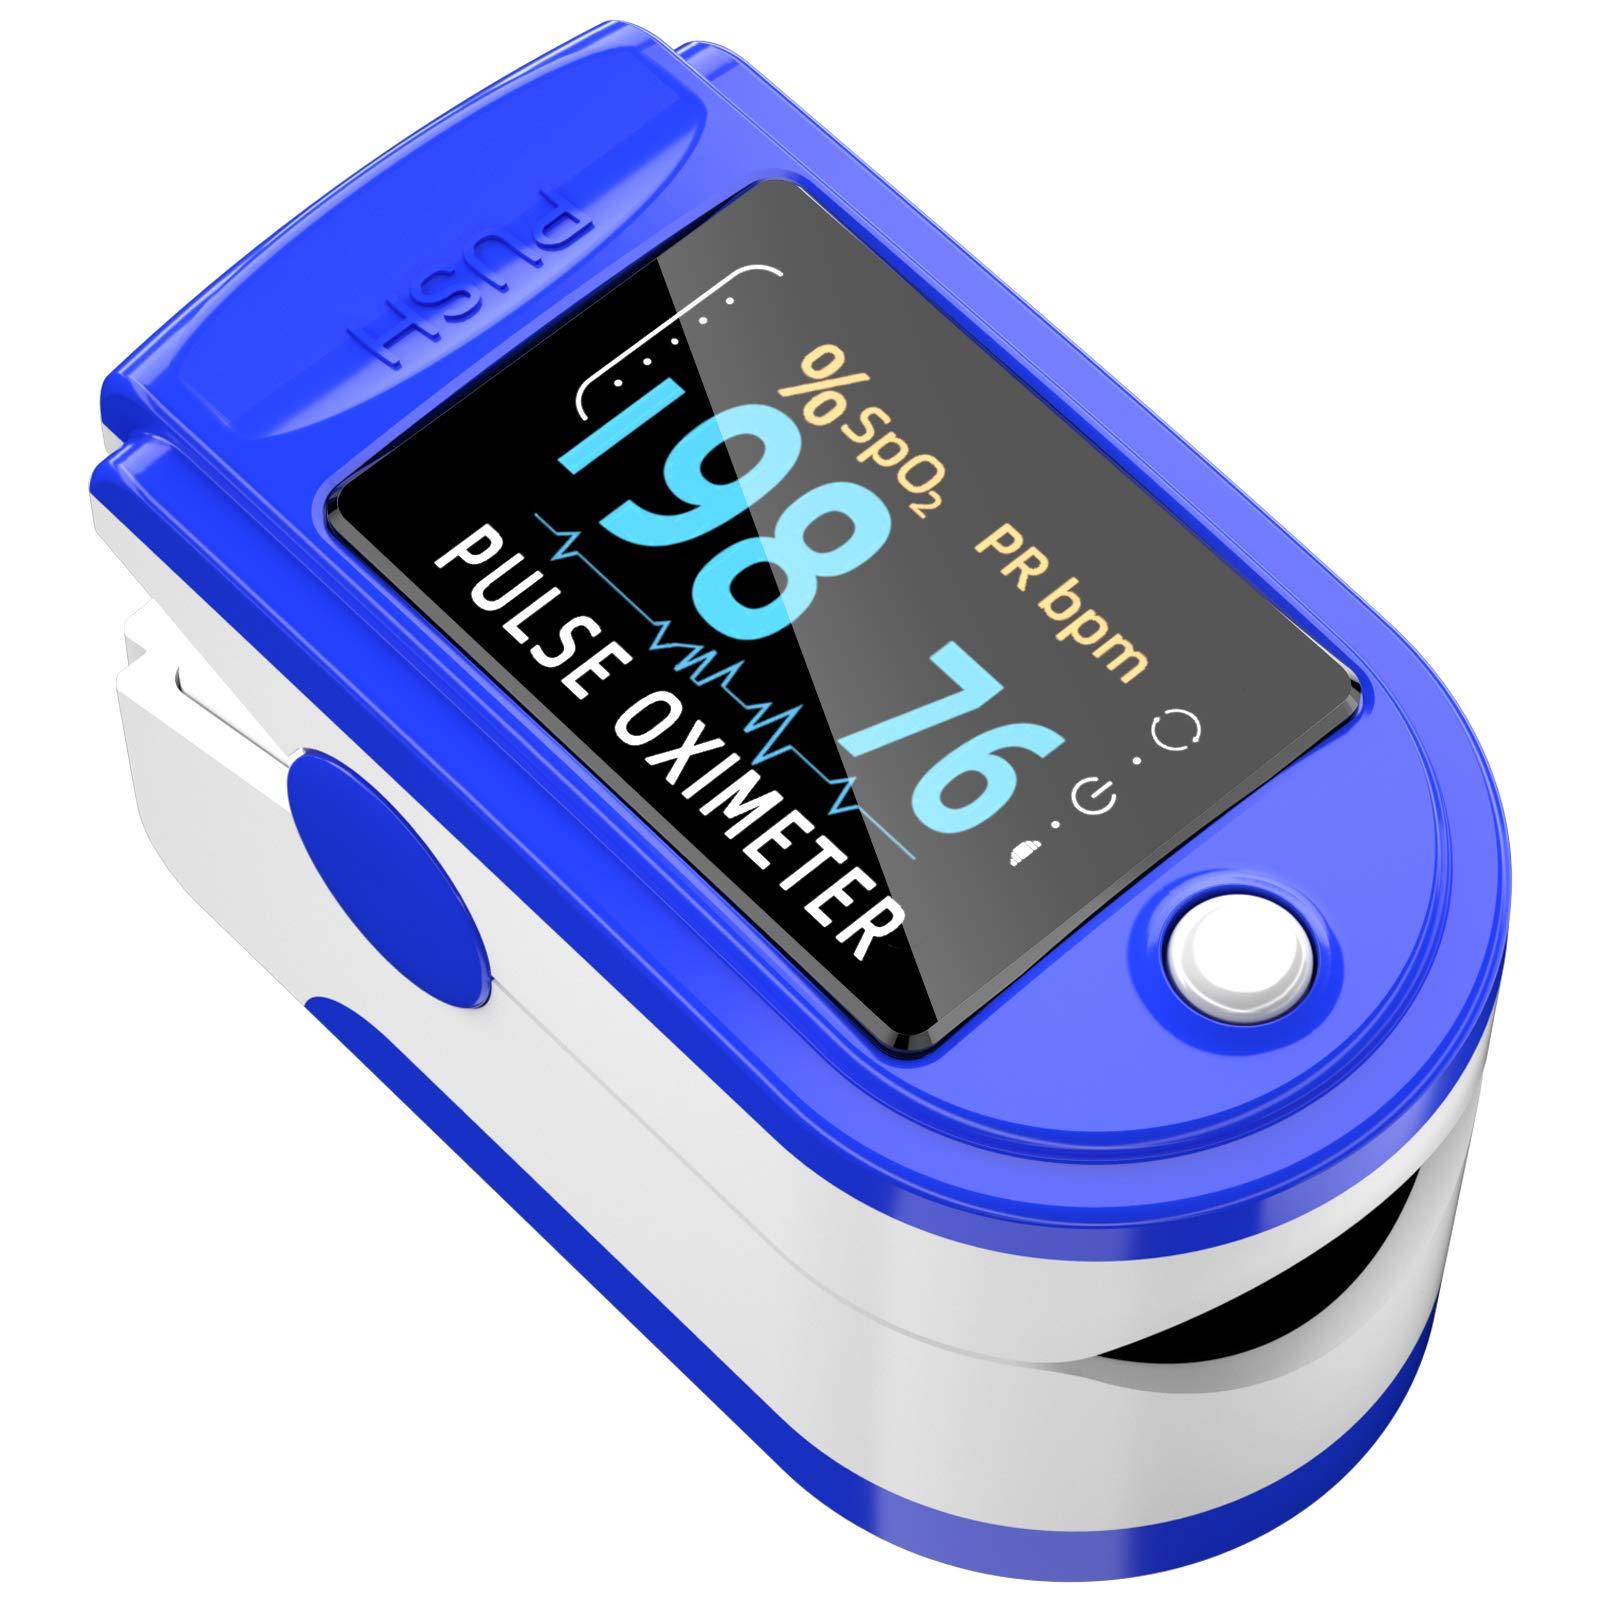 Pulse Oximeter Fingertip, Blood Oxygen Saturation Monitor Fingertip, Blood Oxygen Meter Finger Oximeter Finger with Pulse, O2 Monitor Finger for Oxygen